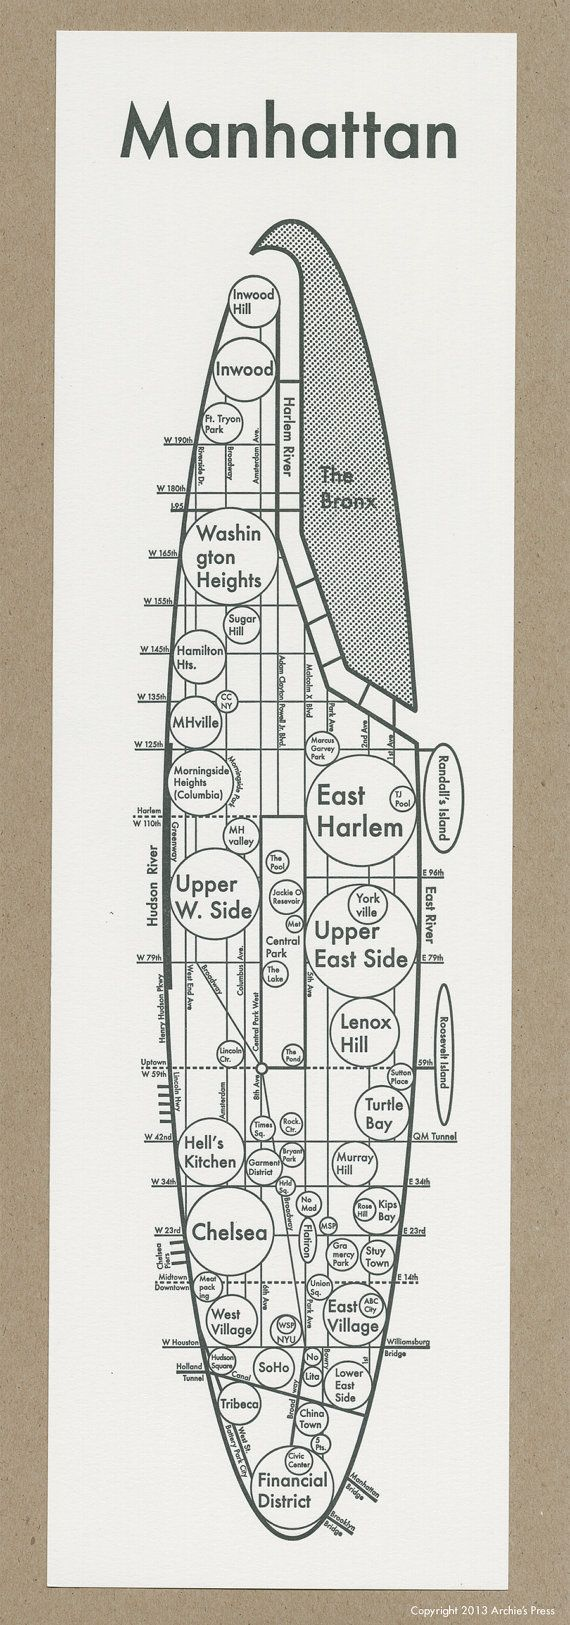 Manhattan Map 4.75″ x 16″ Letterpress. Beautiful Minimalist Simple Graphic Neighborhood Art Print. Cool Travel Poster Design